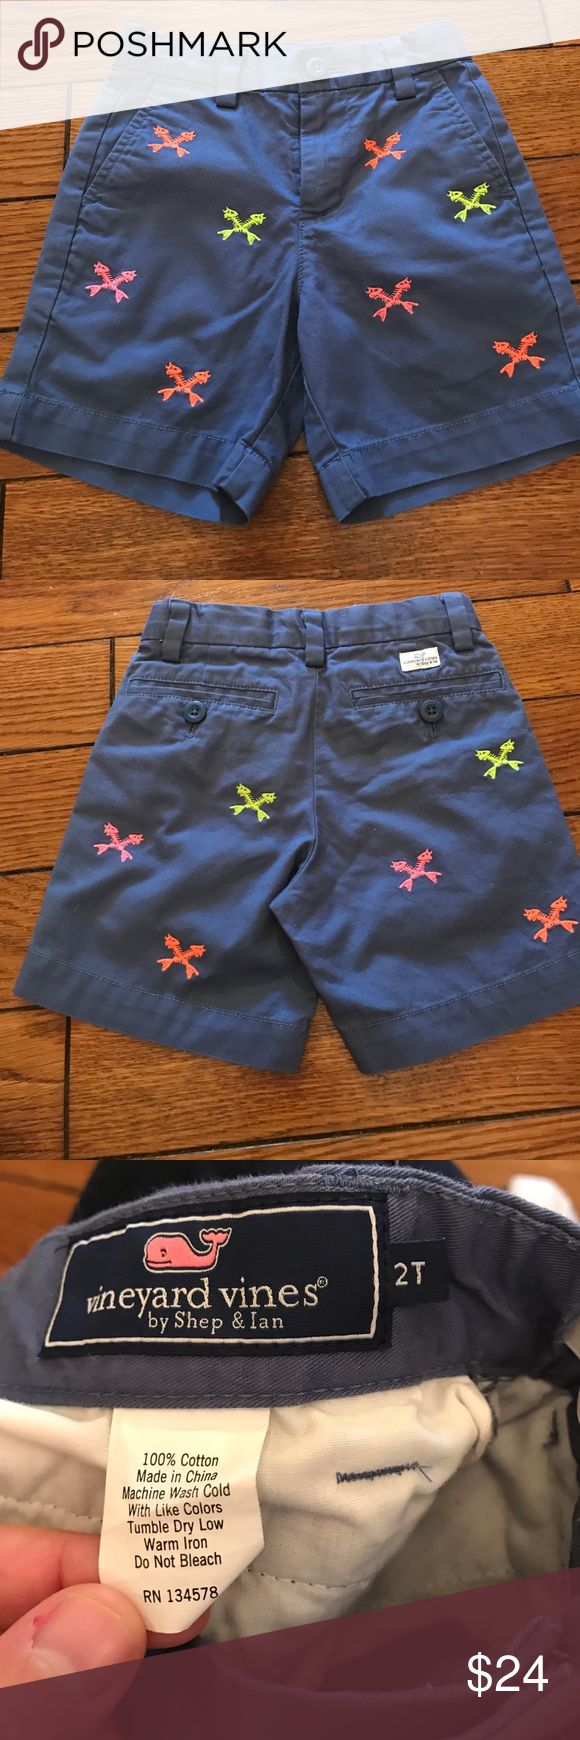 Vineyard Vines boys shorts Vineyard Vines boys shorts.  Good condition, hardly worn.  Bundle to save! Vineyard Vines Bottoms Shorts